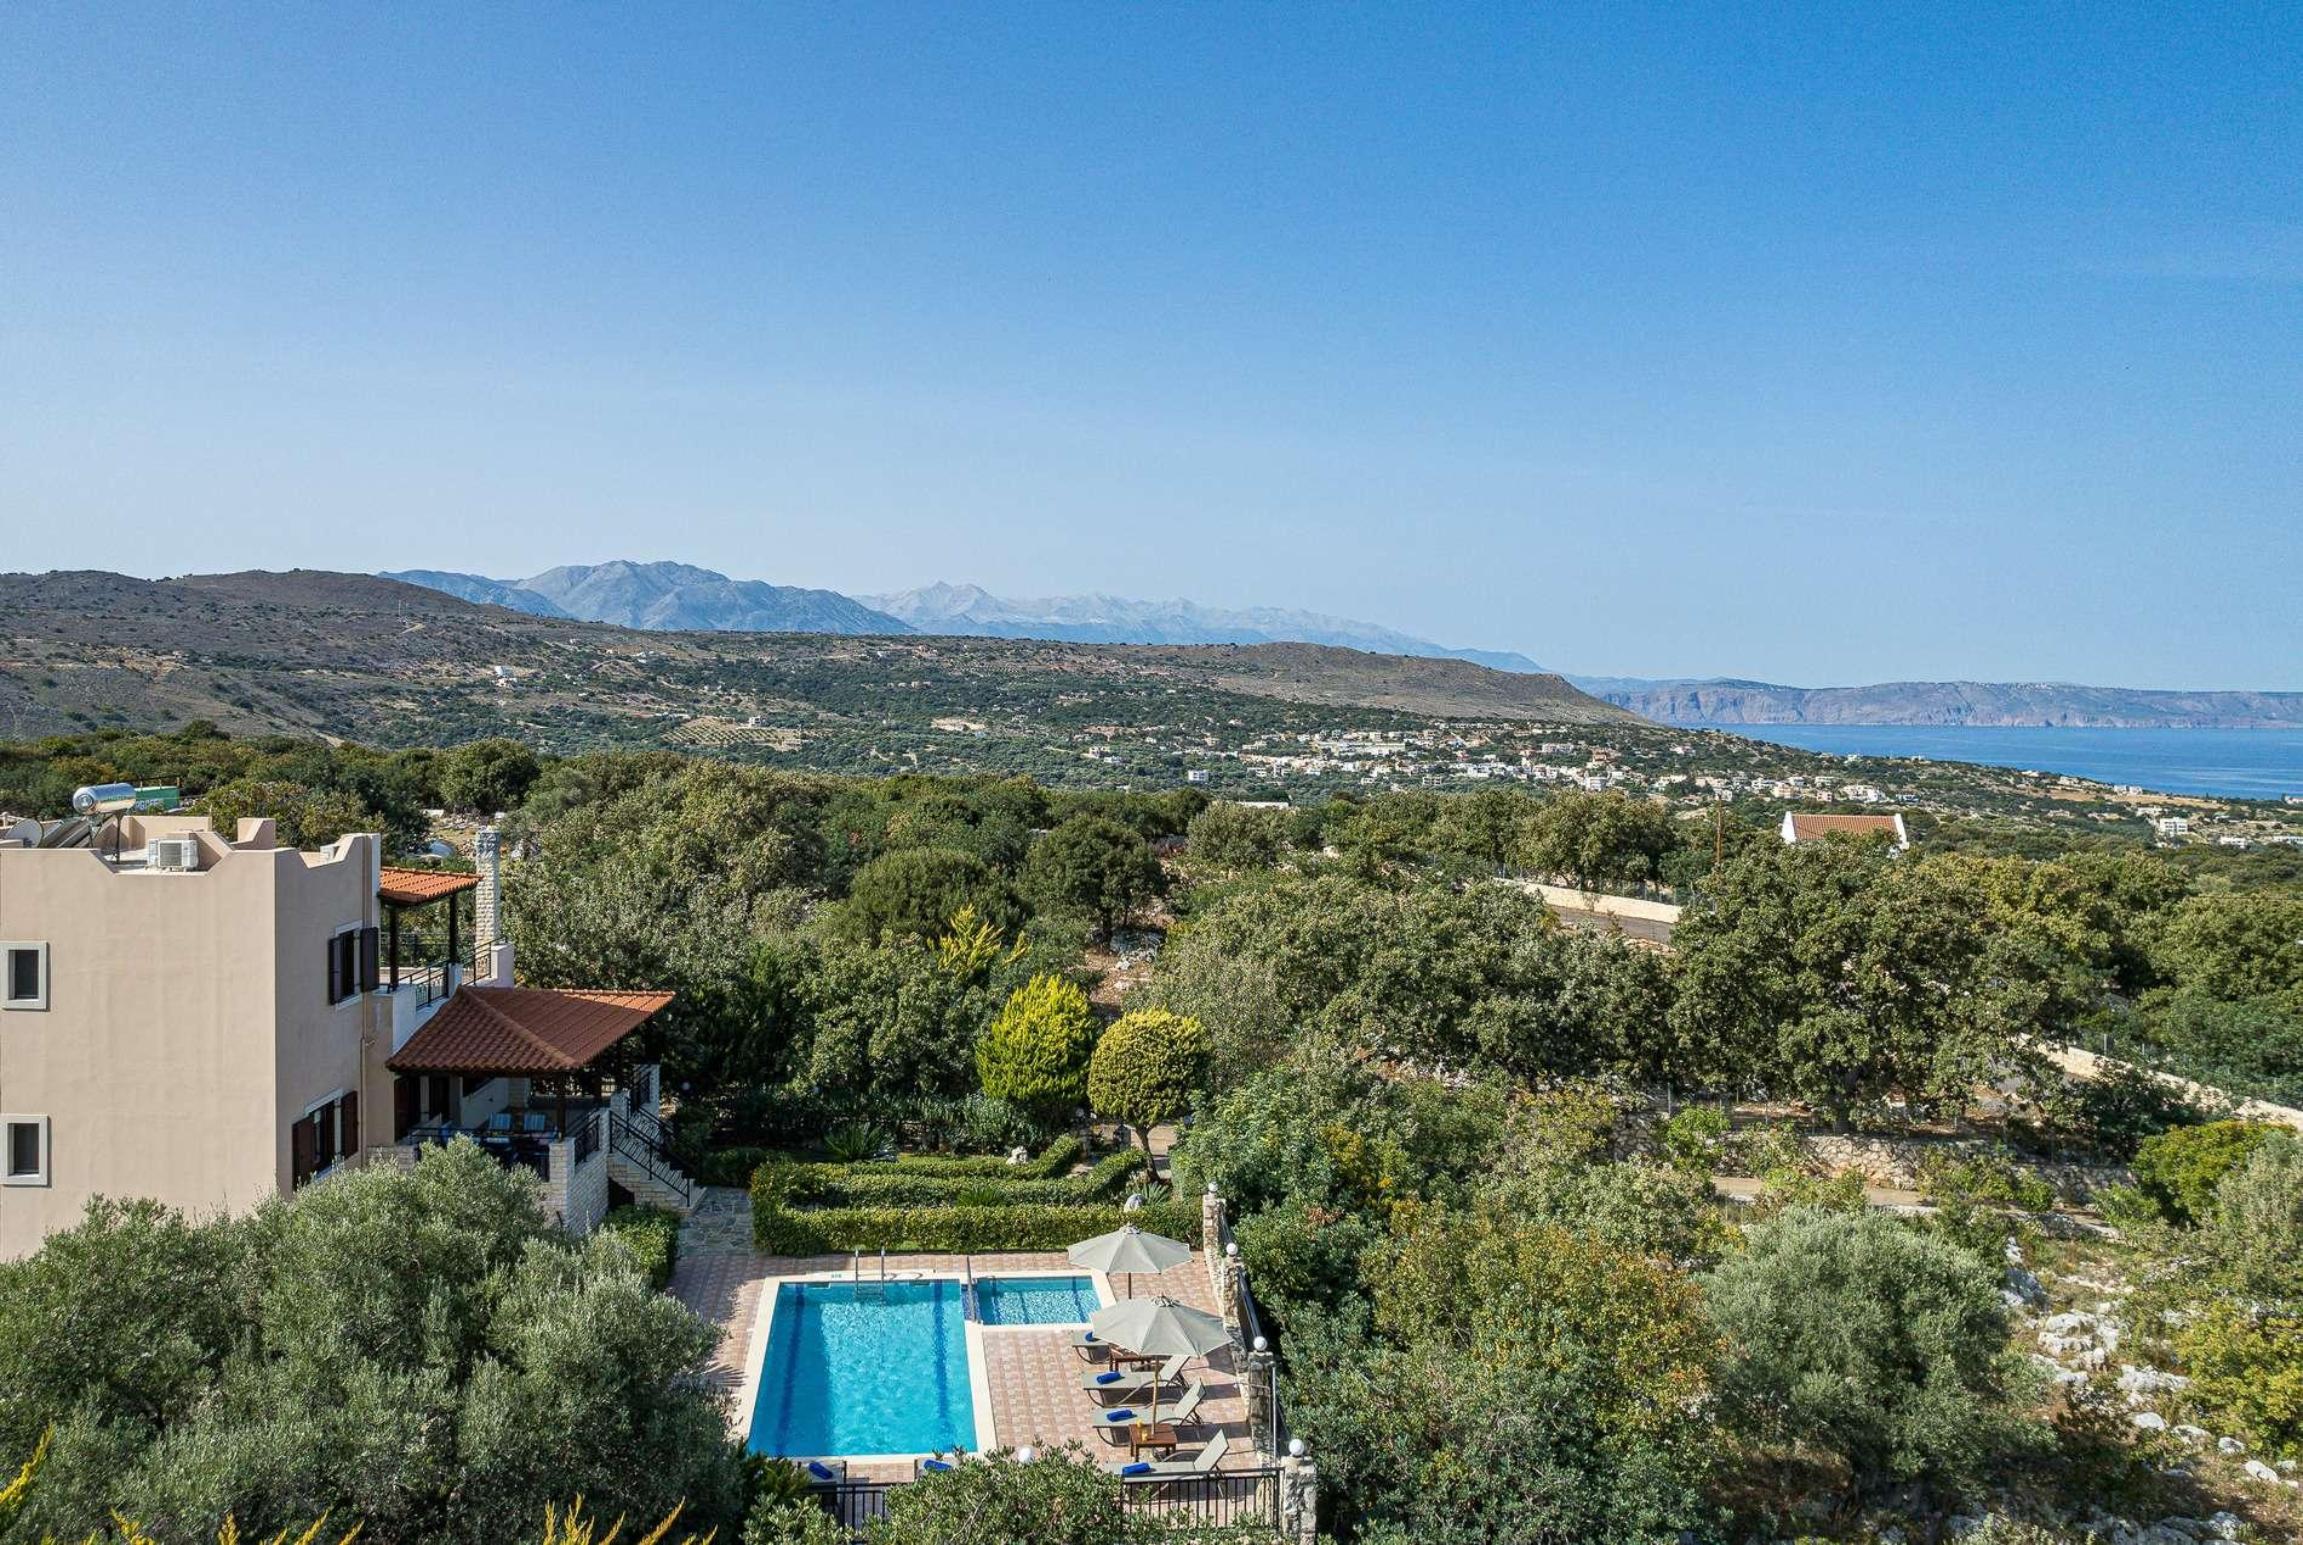 Ferienhaus Nefeli (2653931), Rethymno, Kreta Nordküste, Kreta, Griechenland, Bild 1